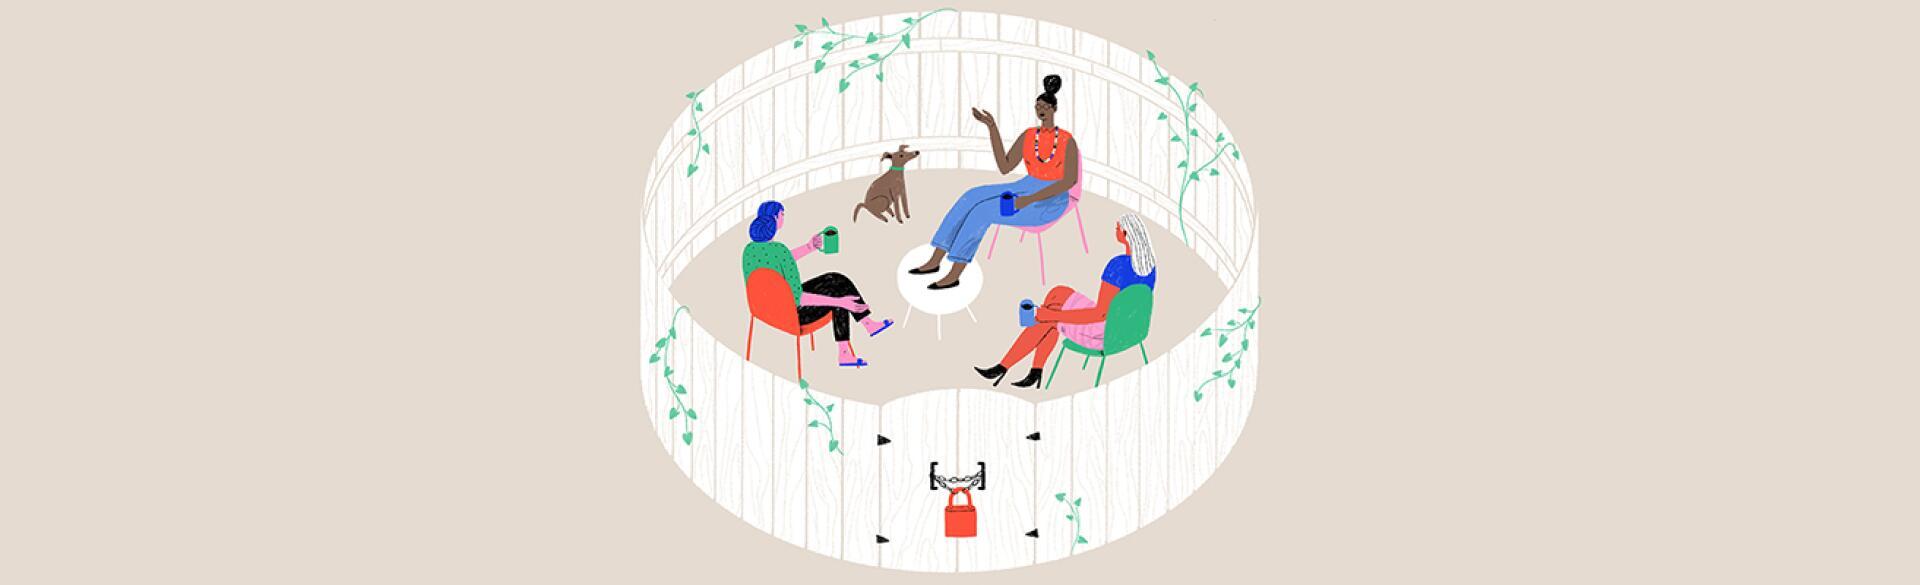 illustration_of_friends_sitting_inside_a_fenced_circle_by_monica_garwood_1440x400.jpg